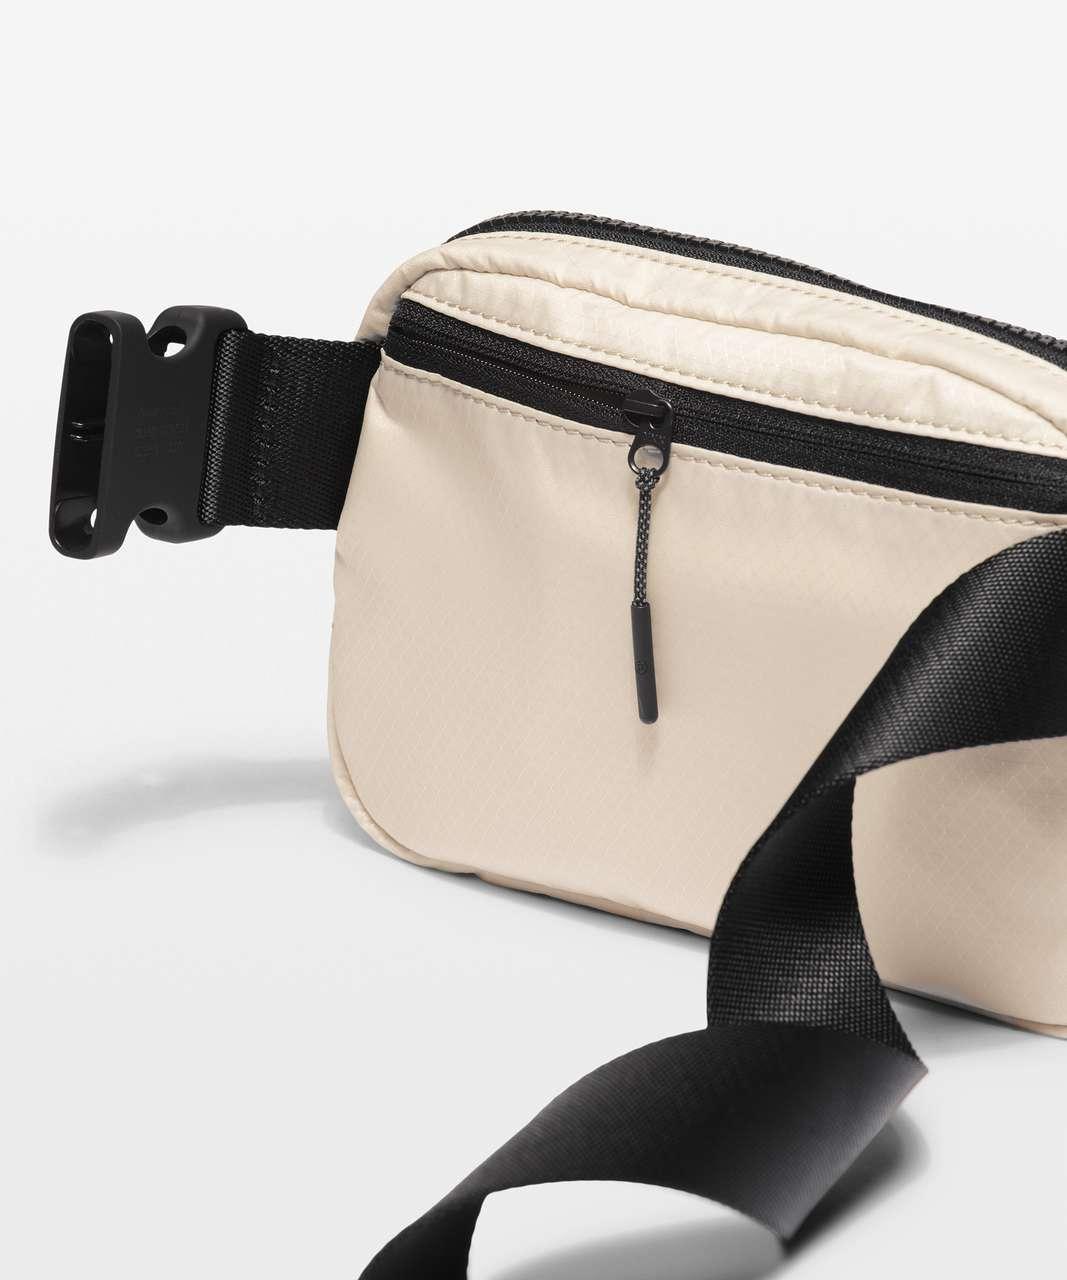 Lululemon Everywhere Belt Bag *1L - White Opal / Black